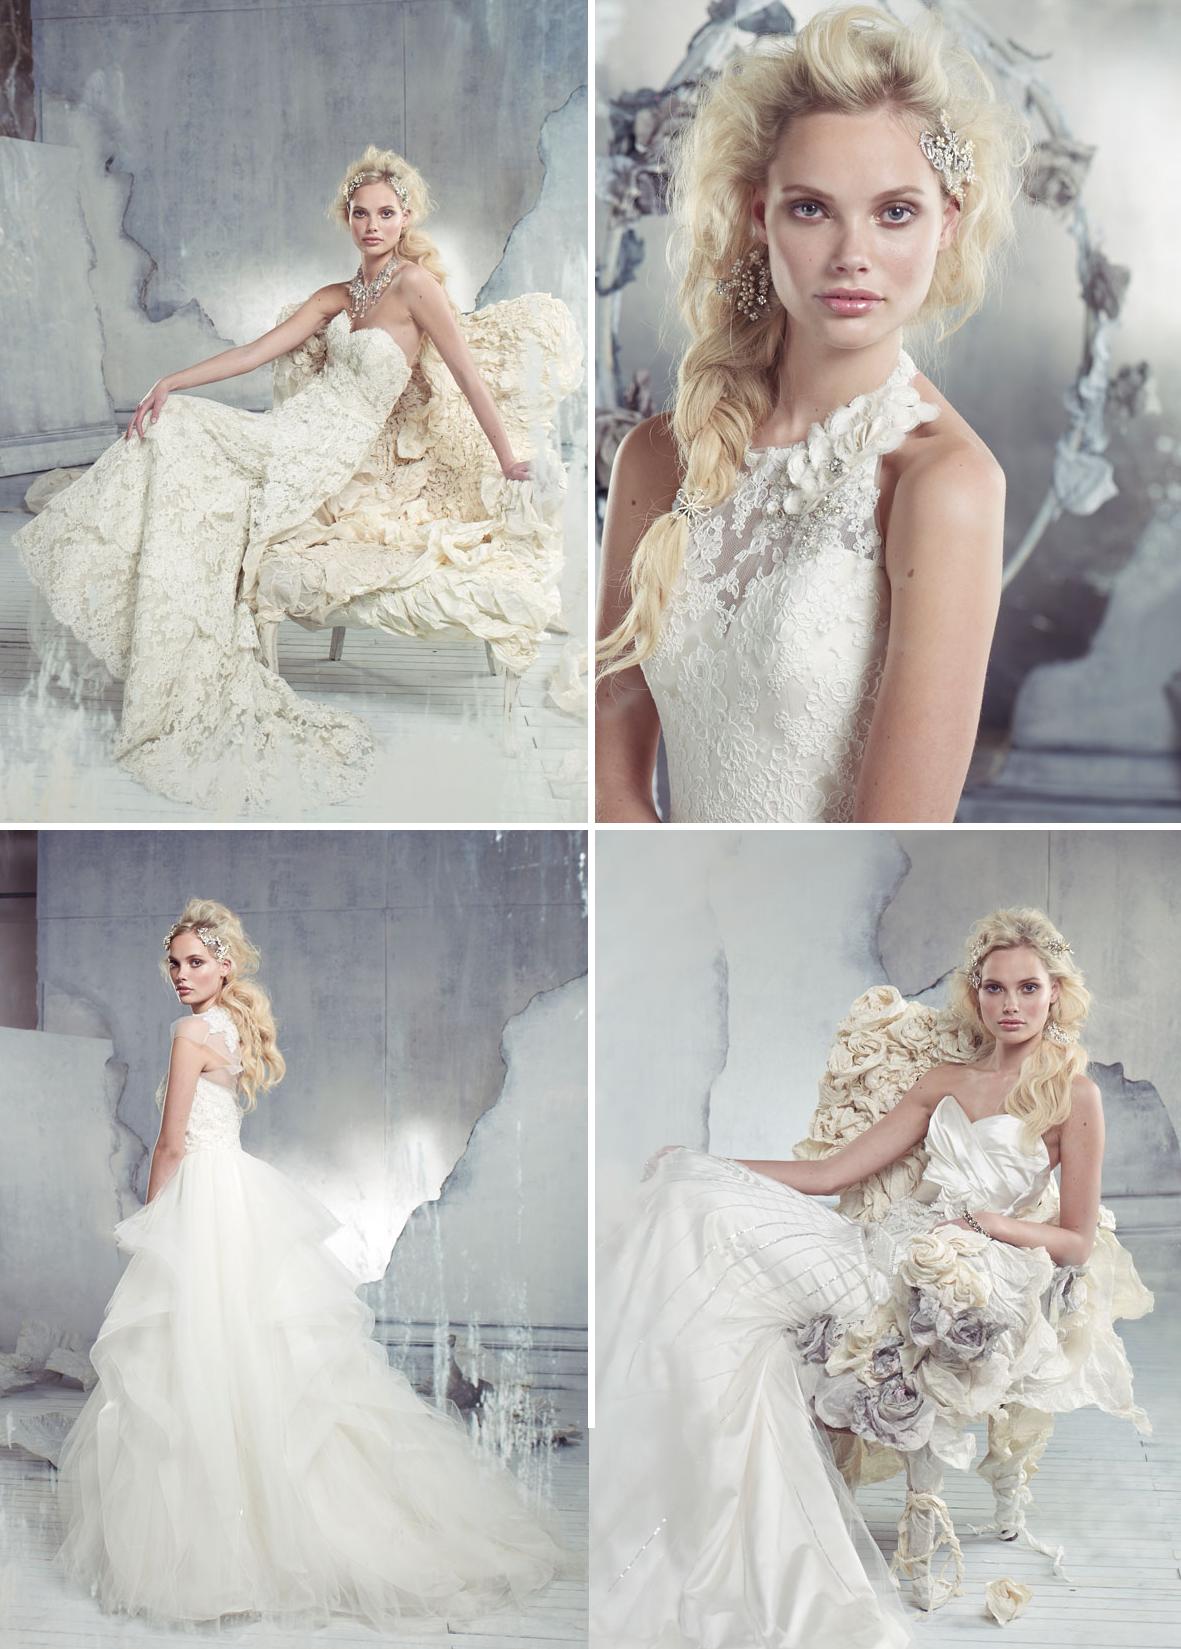 2013 wedding dresses from alvina valenta bridal 2 for Alvina valenta wedding dress